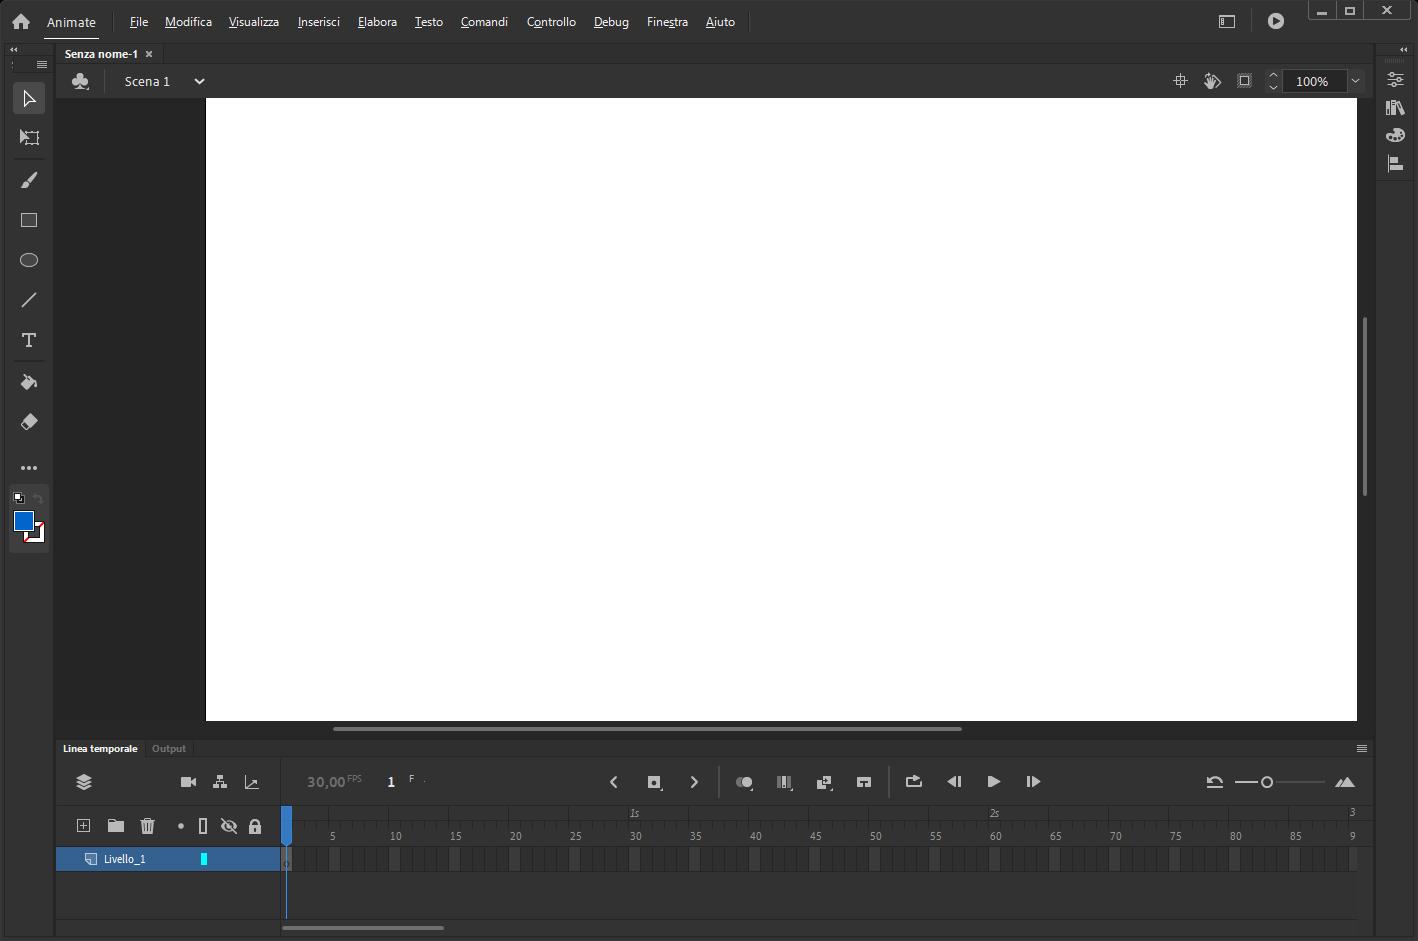 Adobe Animate 2020 v20.0.2.22168 64 Bit - ITA